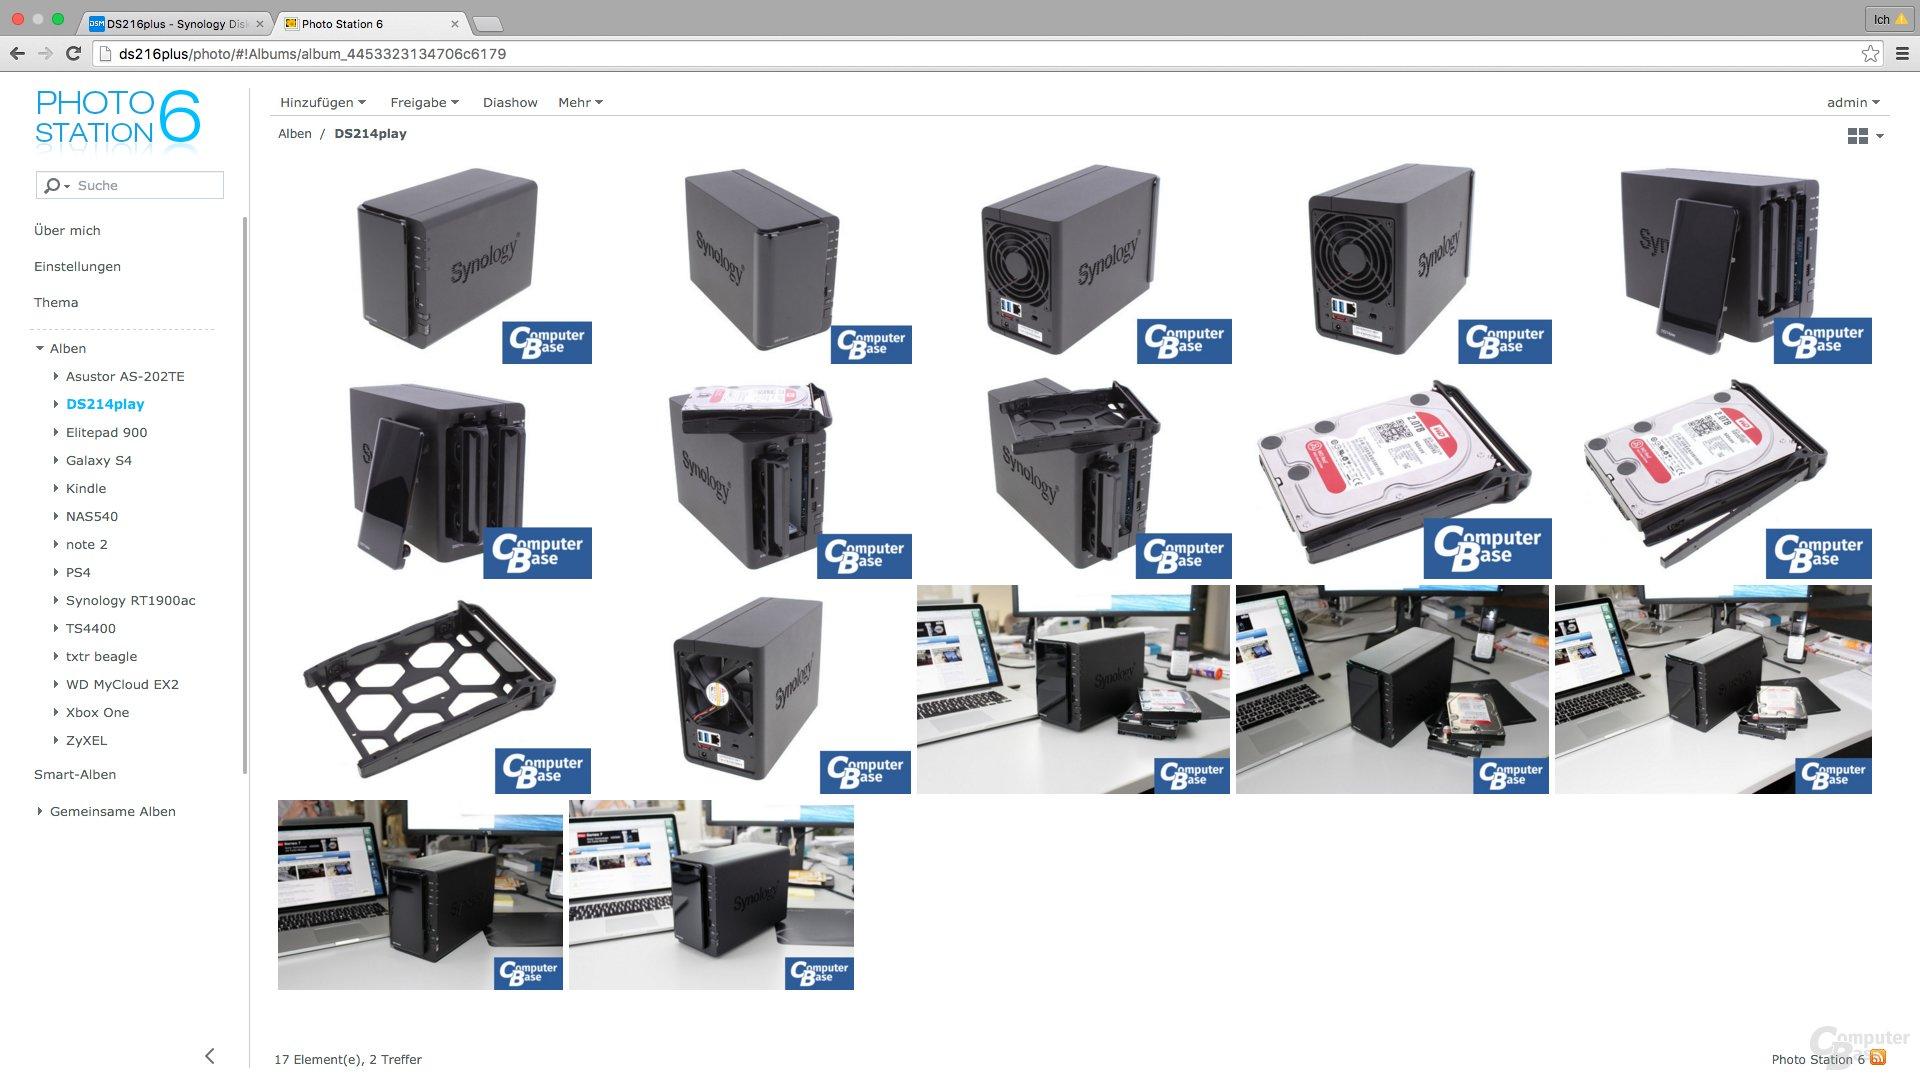 Synology DSM 6.0: Photo Station 6